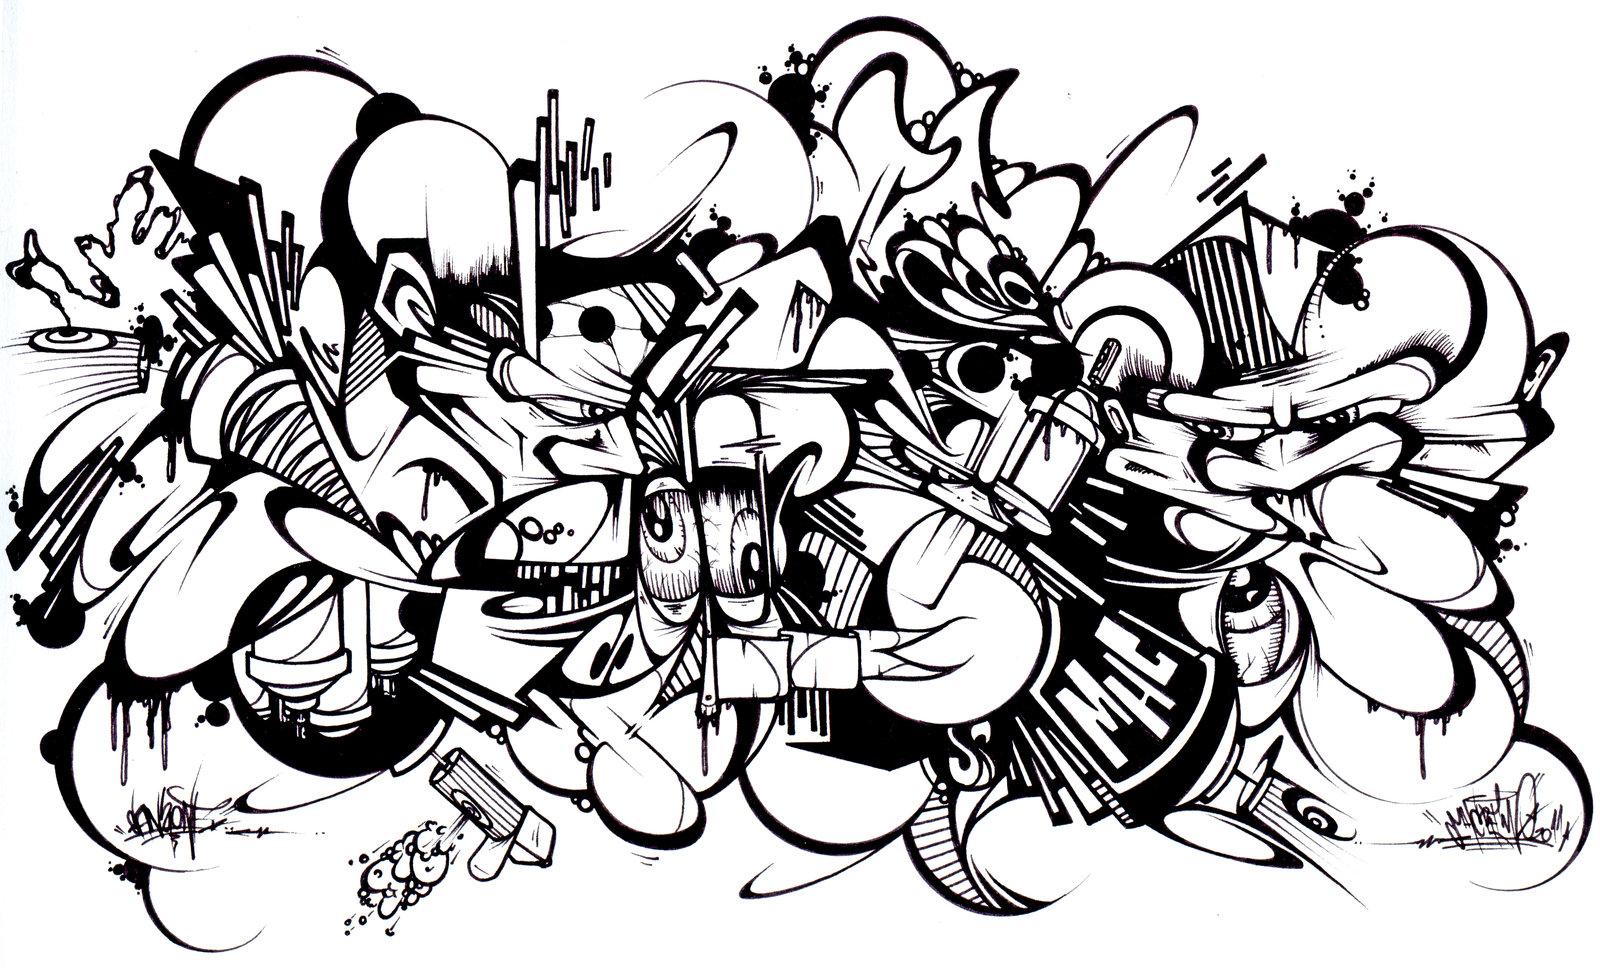 Graffiti Coloring Pages At Getcolorings